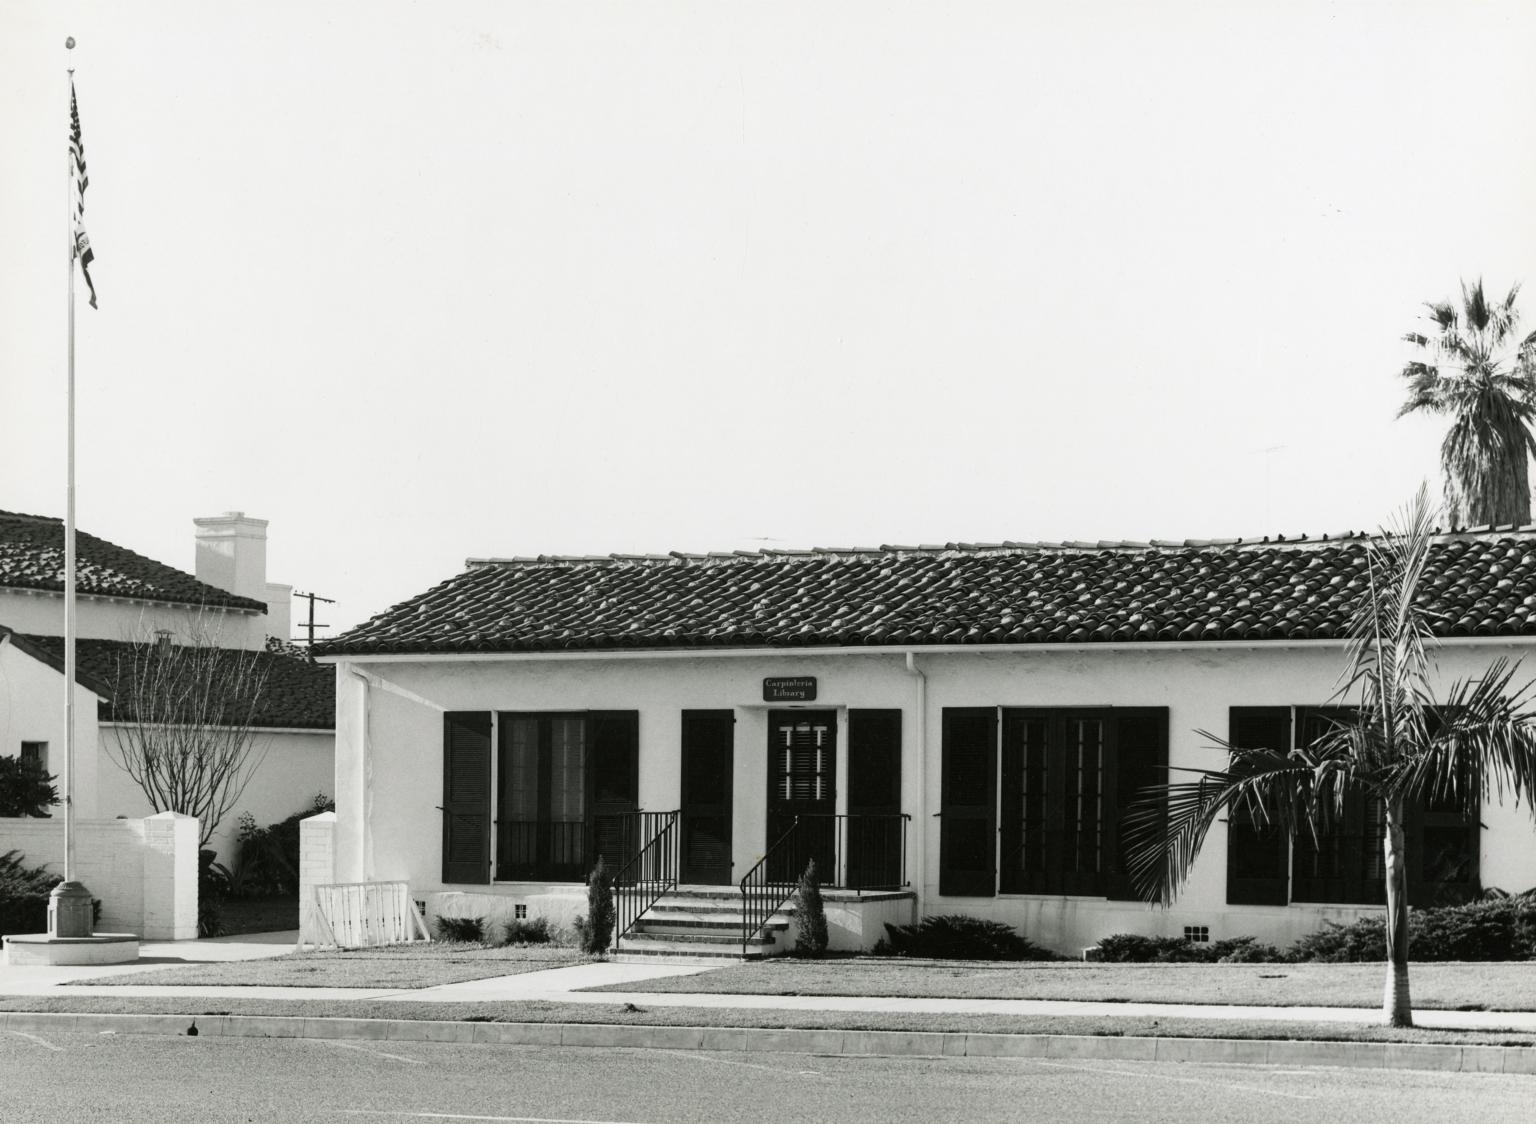 Carpinteria Public Library